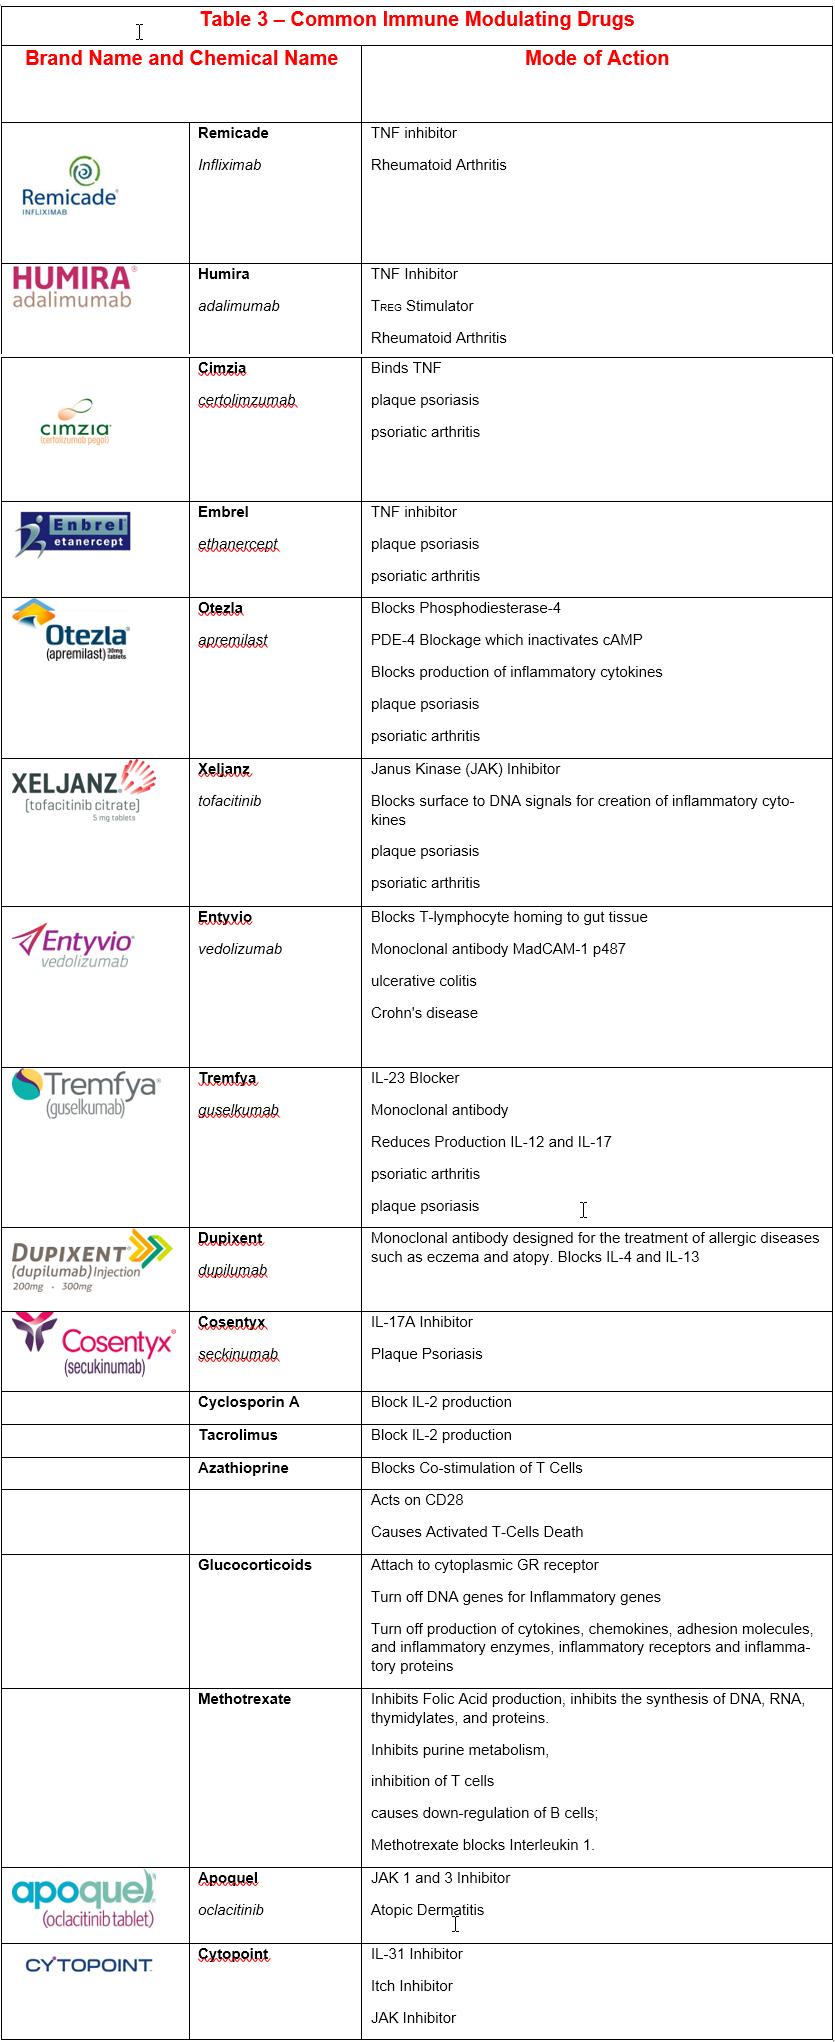 Common Immune Modulating Drugs